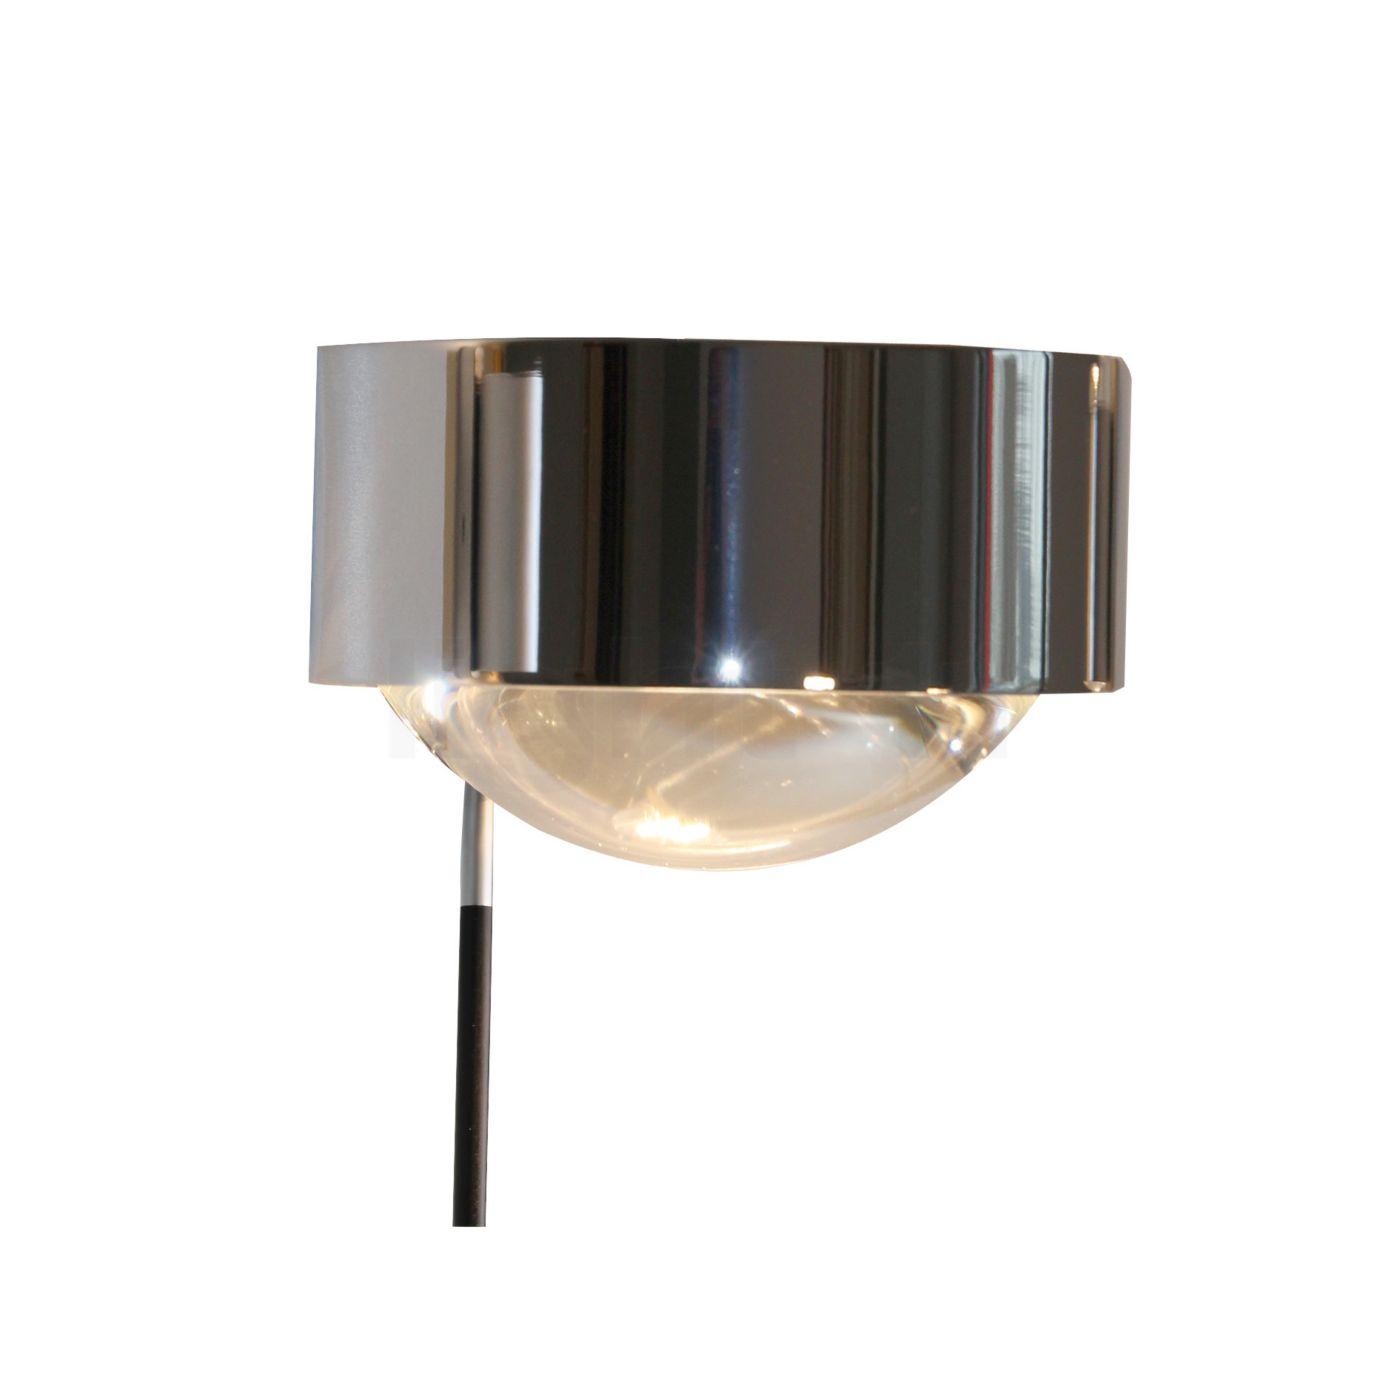 top light puk mirror led mirror lights buy at. Black Bedroom Furniture Sets. Home Design Ideas